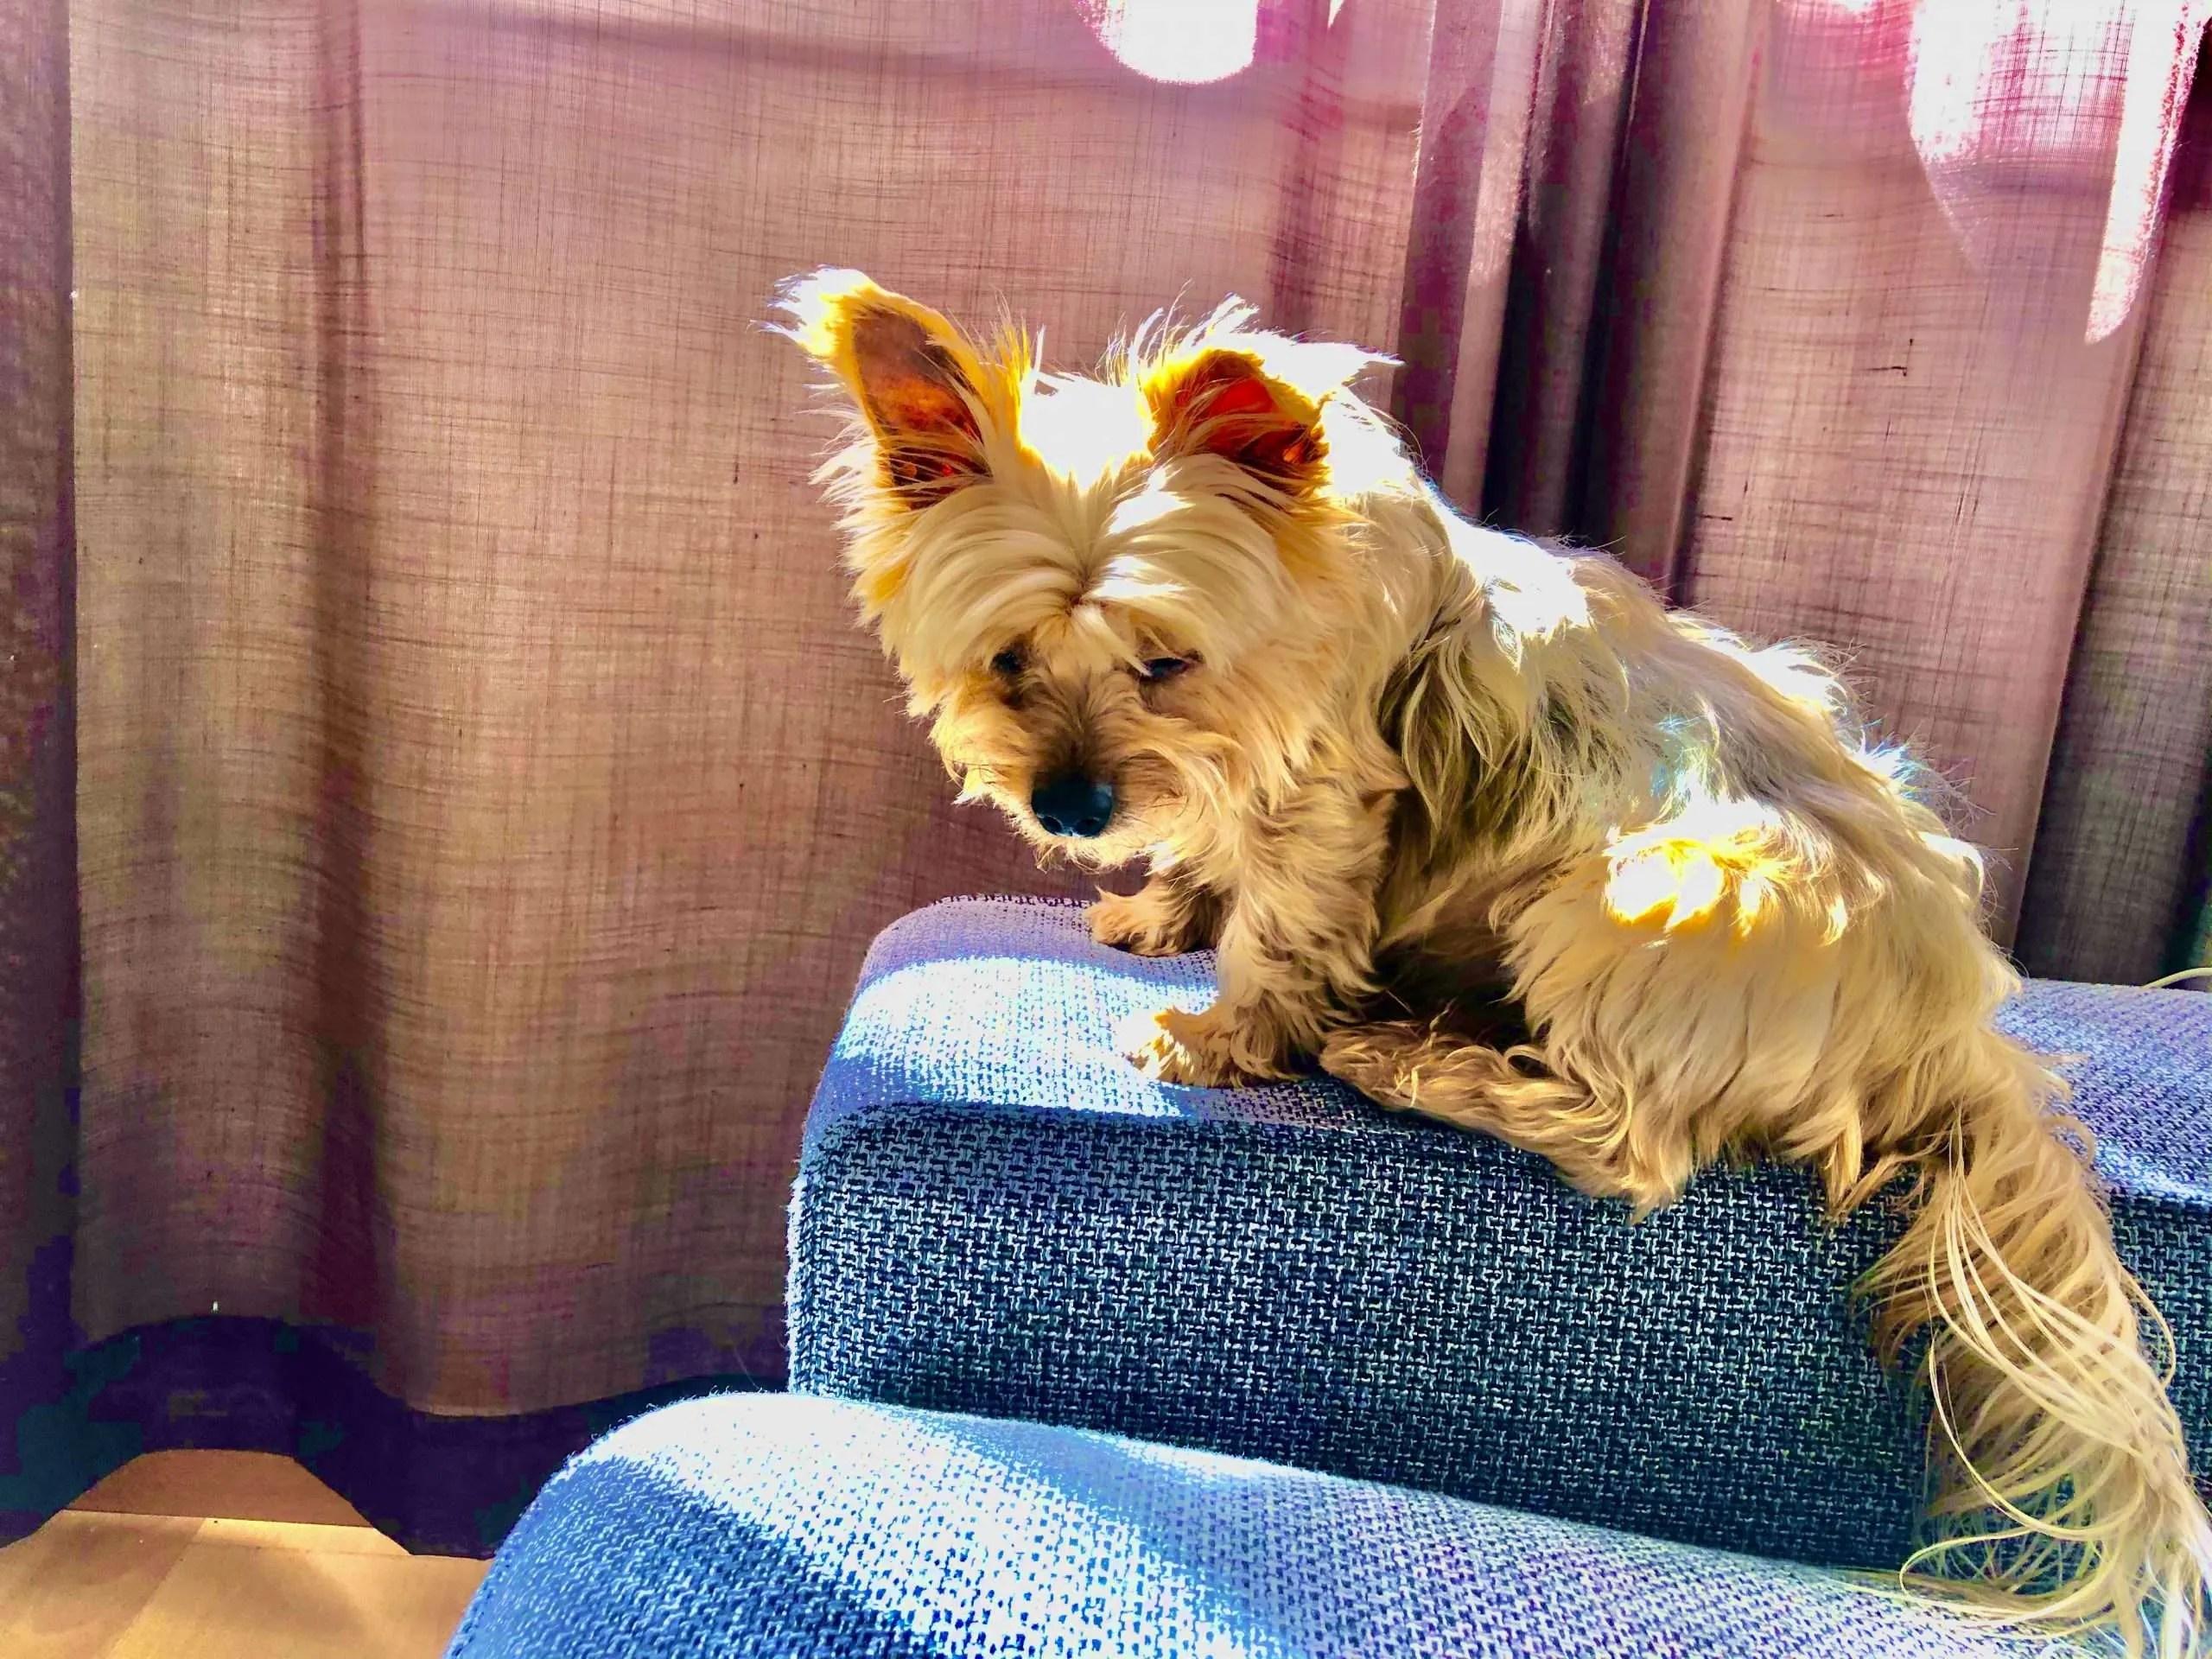 American dog in coronavirus quarantine in Spain: Lockdown Days 6-10